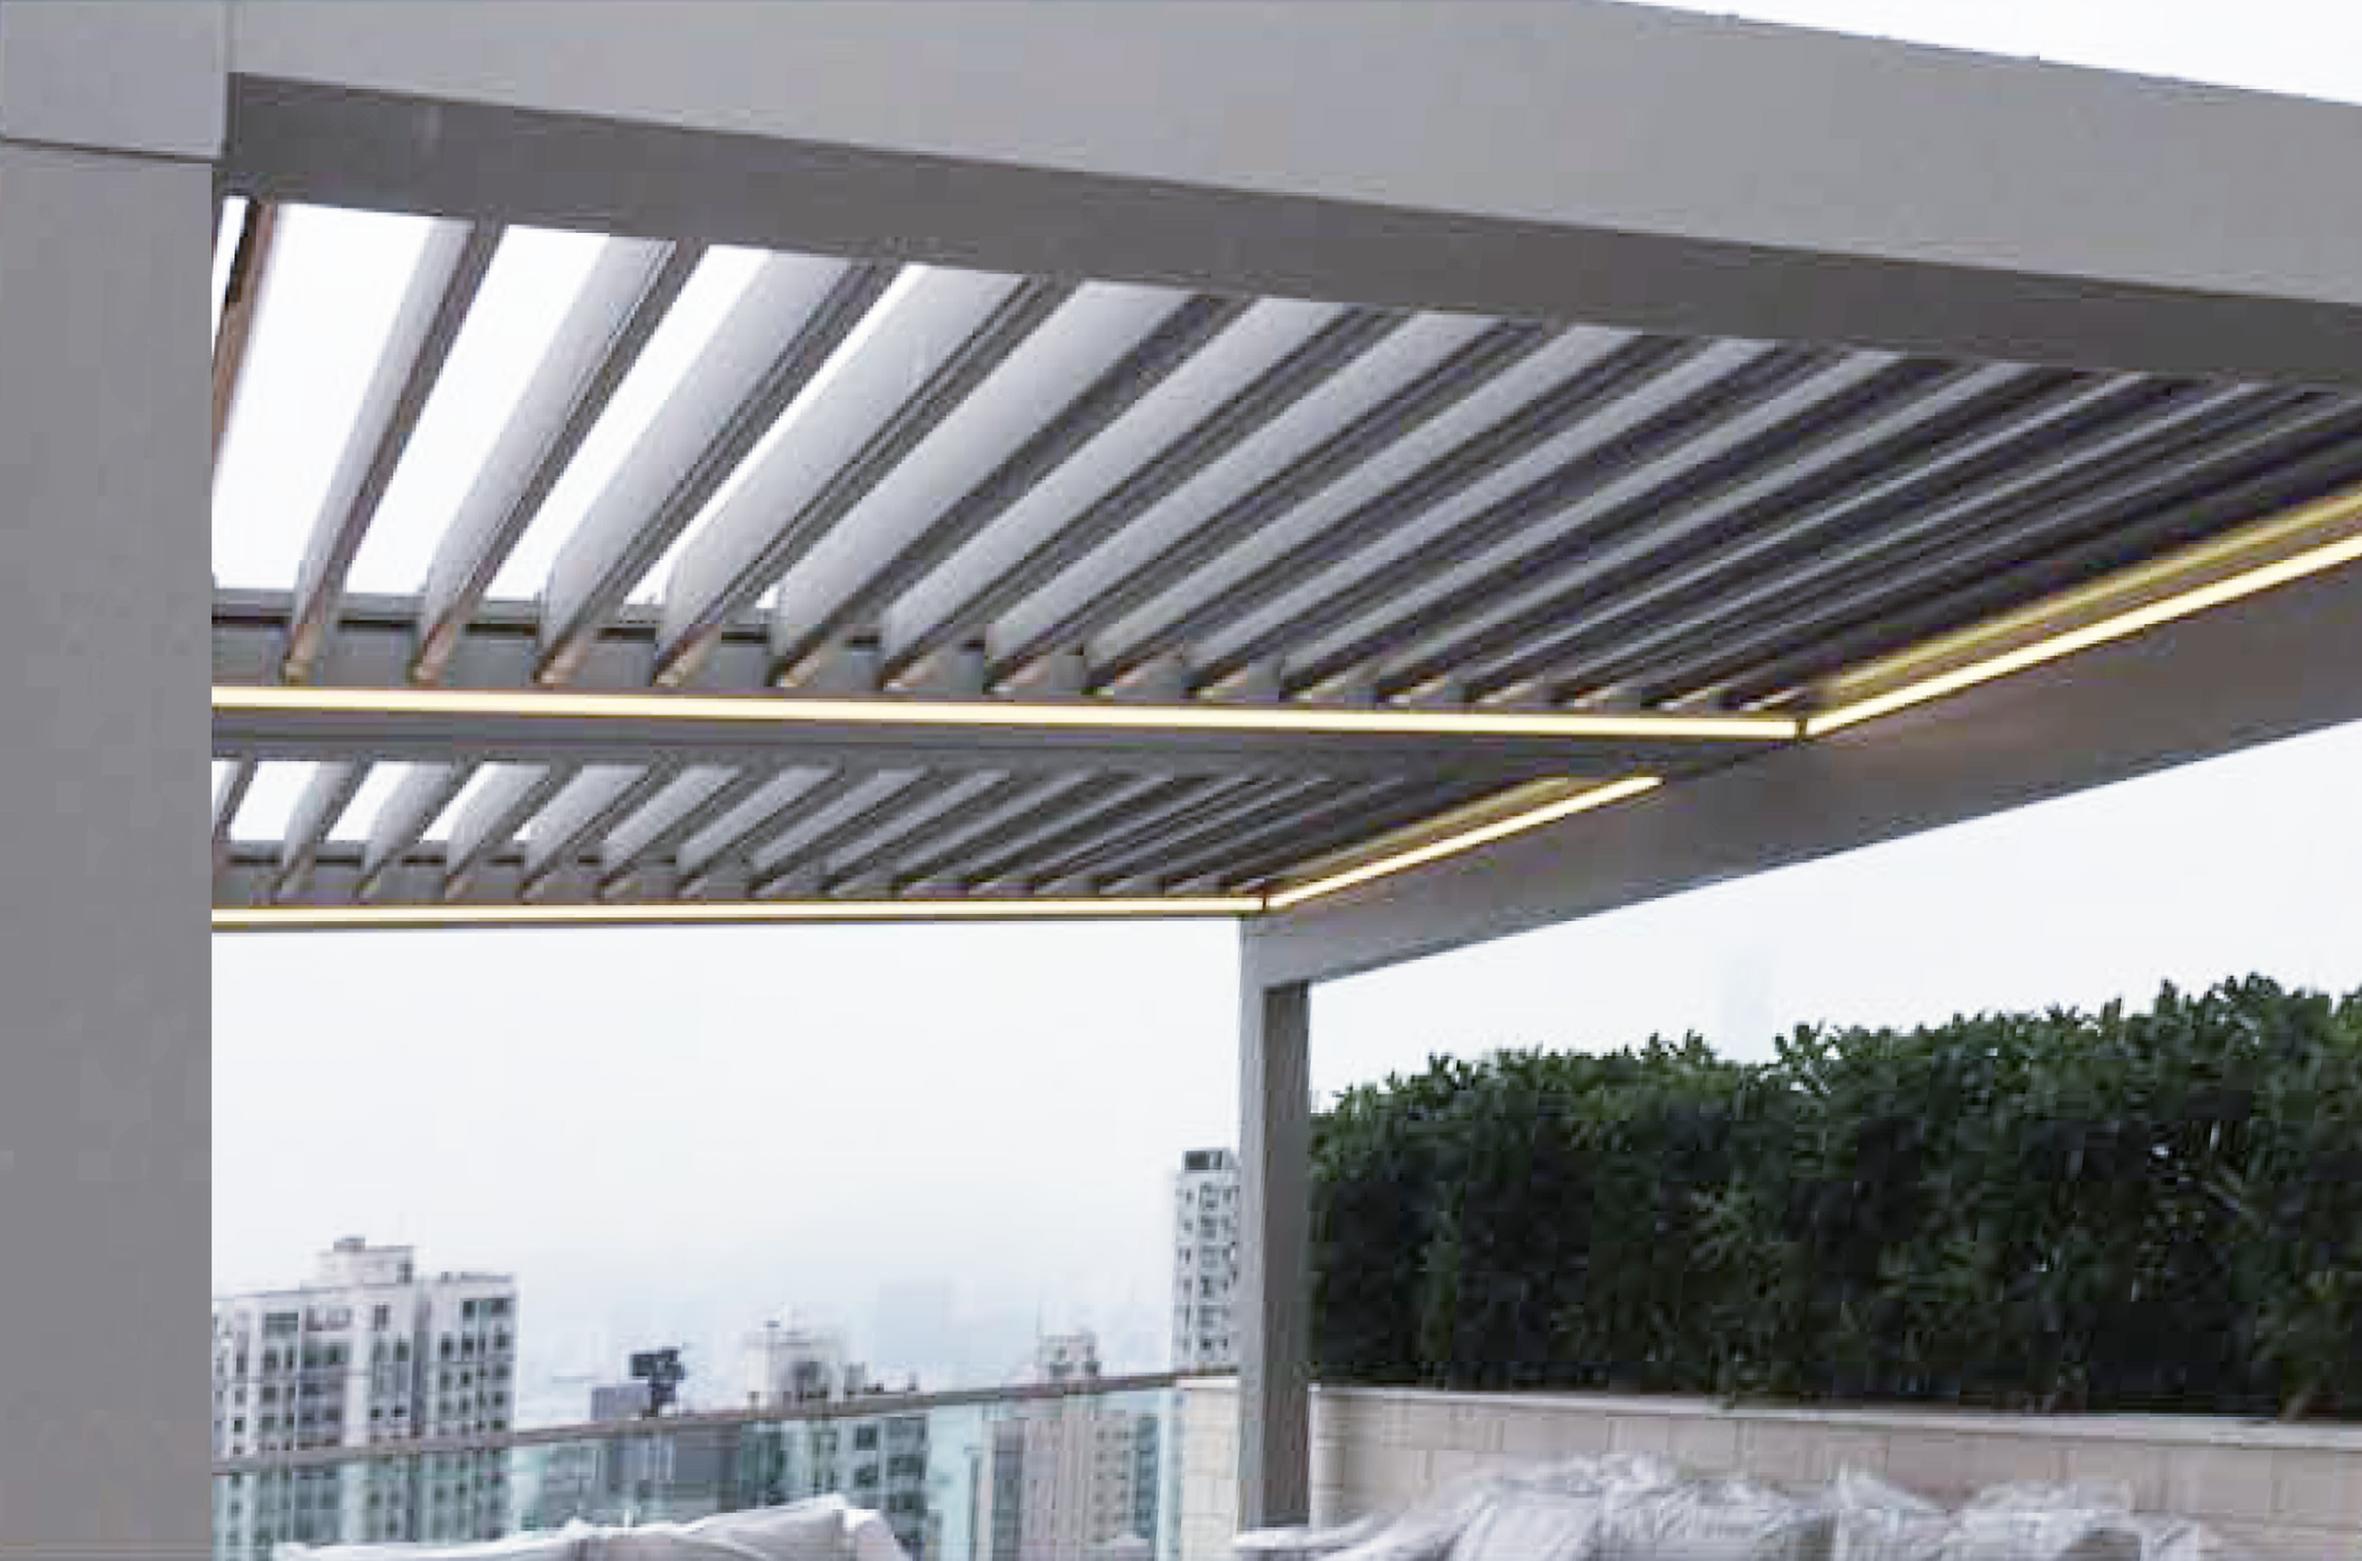 JS Window - Aerolux by Suntech – Cluny Park The modern pergola 露天空間的現代化涼棚